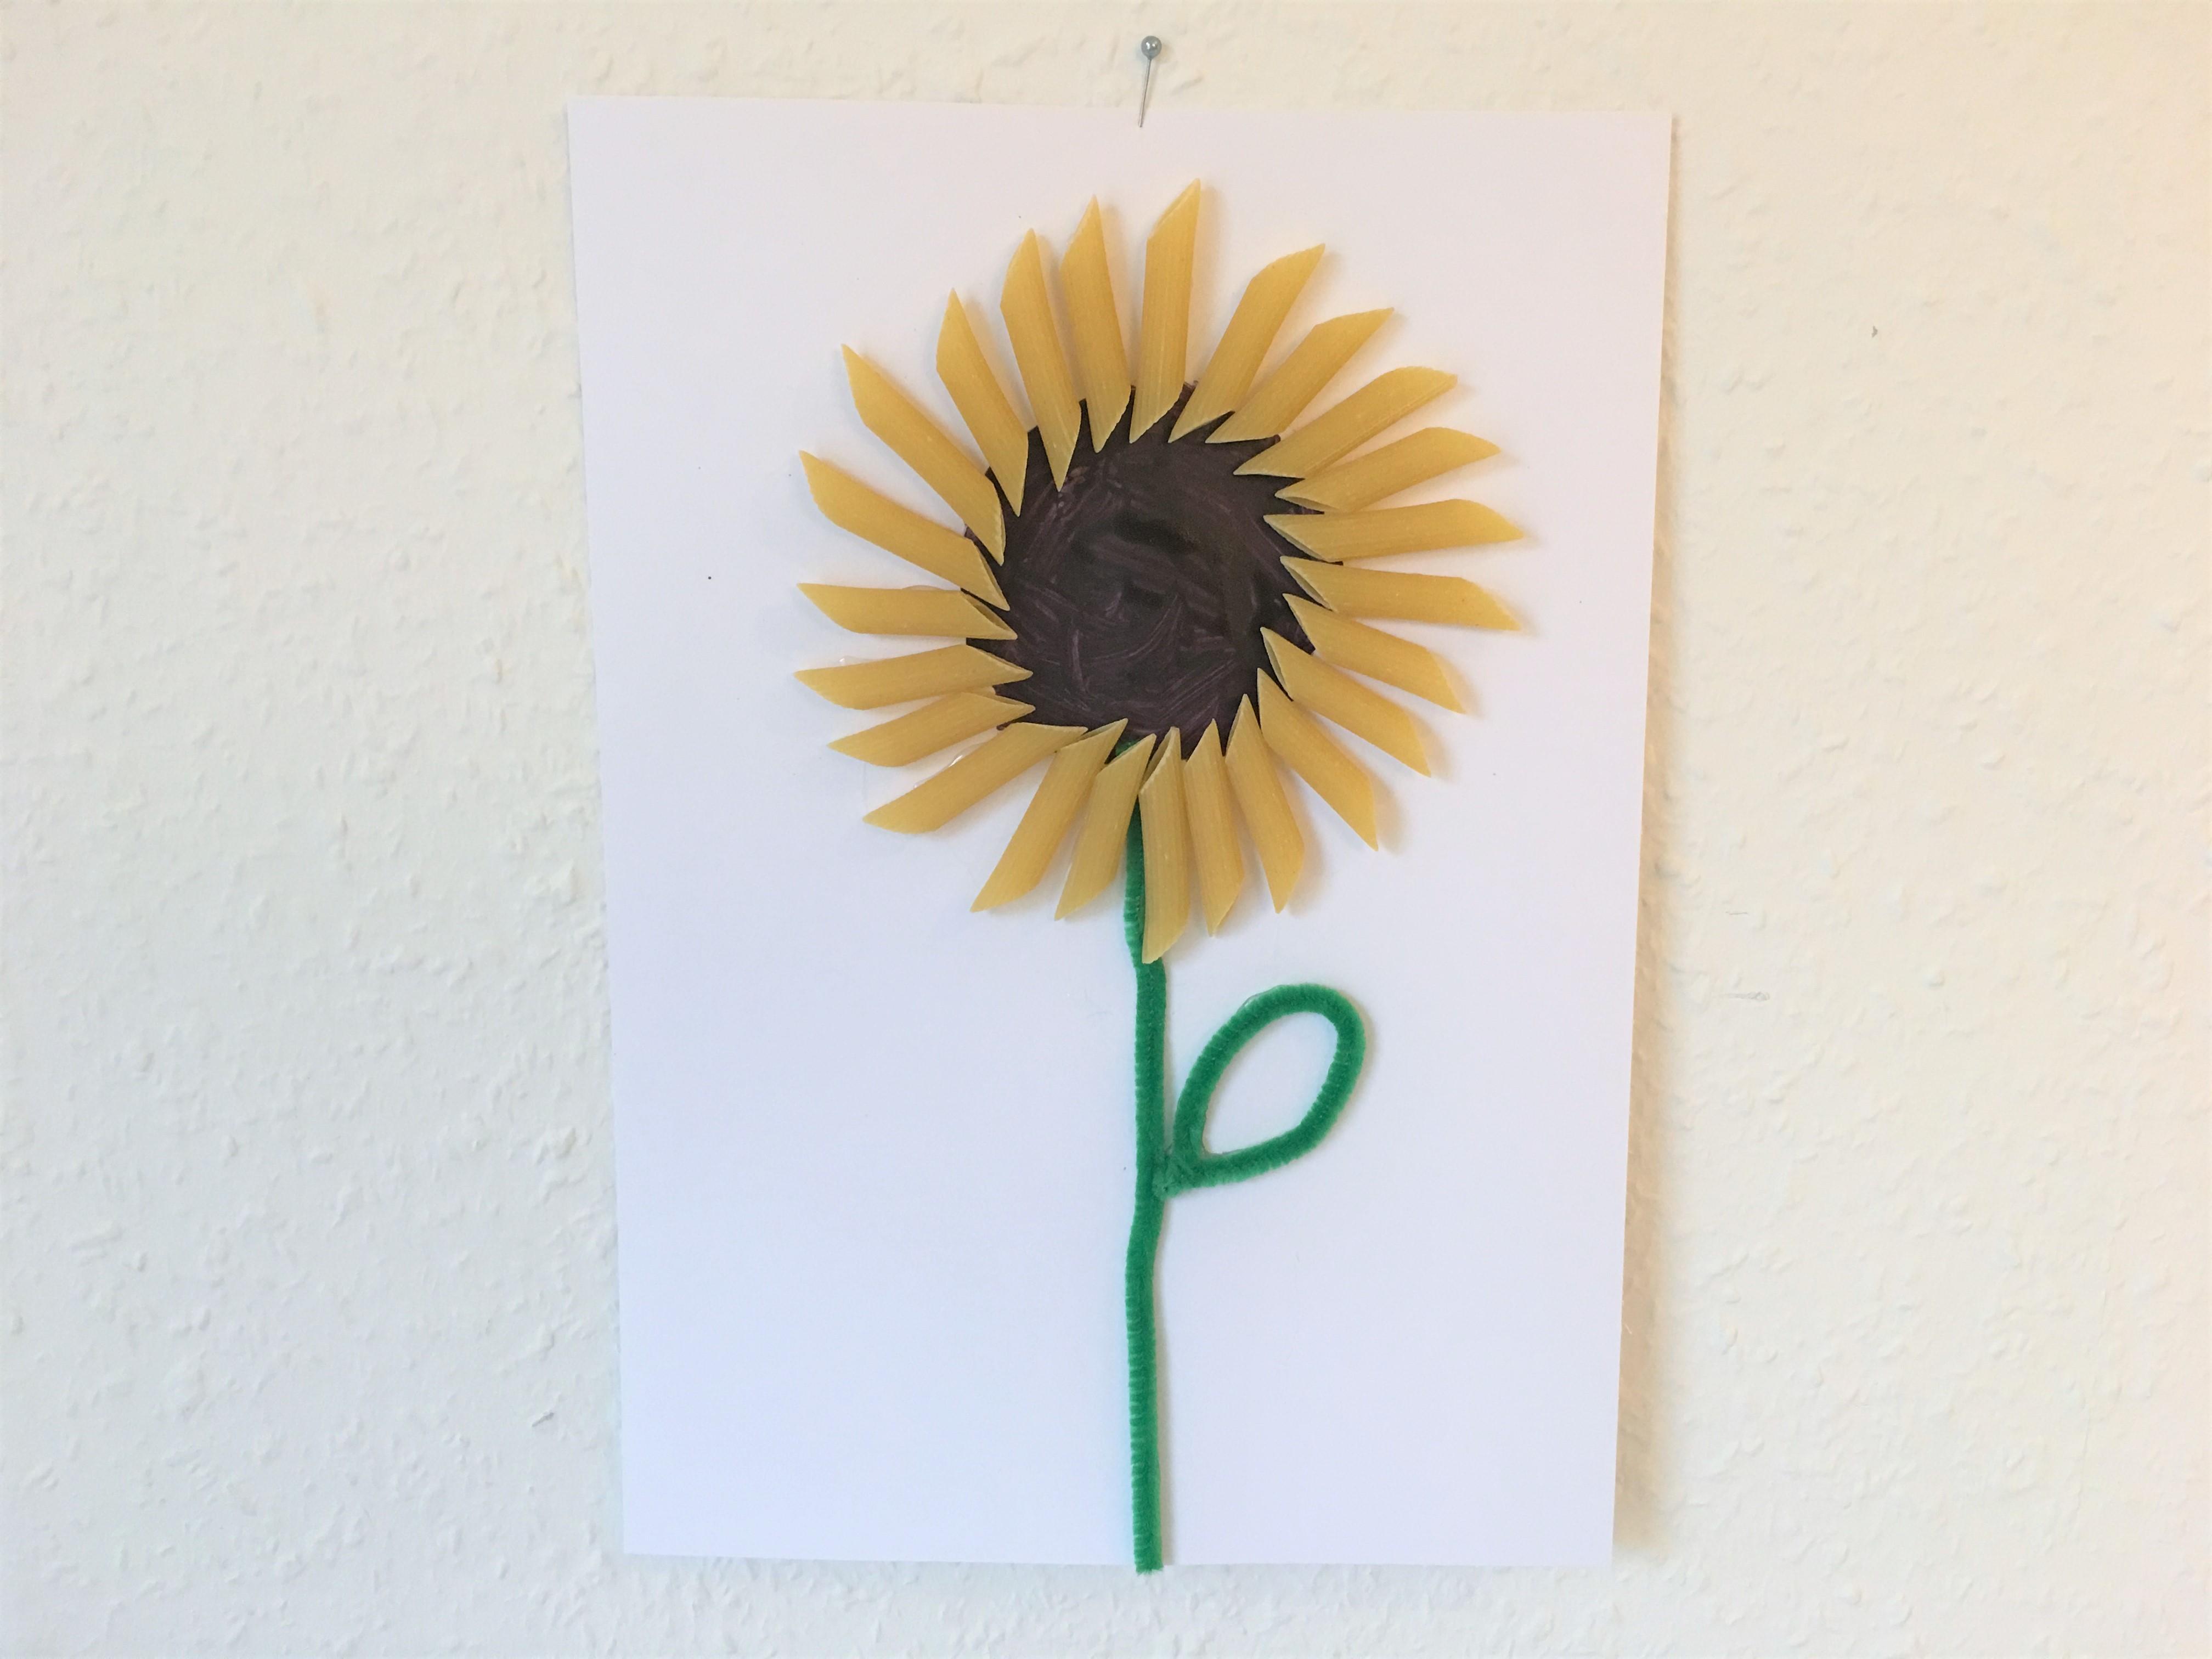 sonnenblumen aus nudeln herbstbasteln mit kindern der familienblog f r kreative eltern. Black Bedroom Furniture Sets. Home Design Ideas